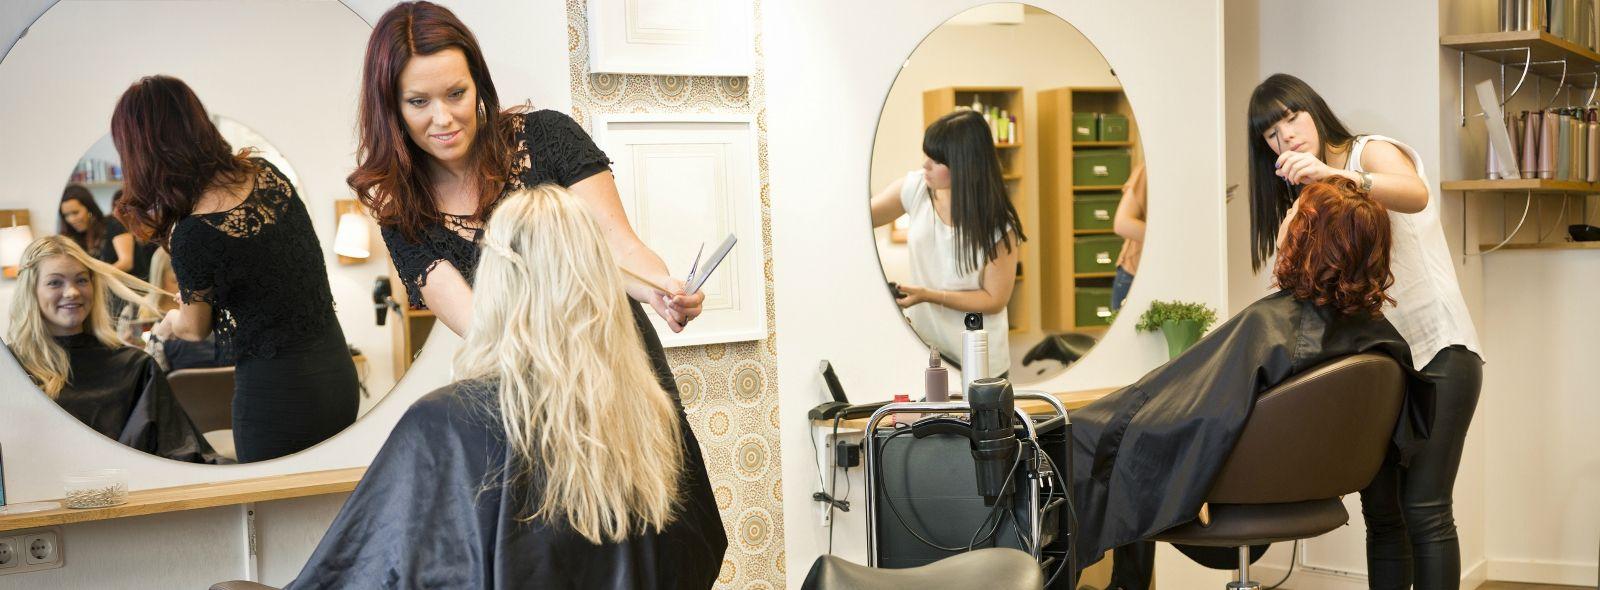 Tutti i parrucchieri Milano aperti lunedì